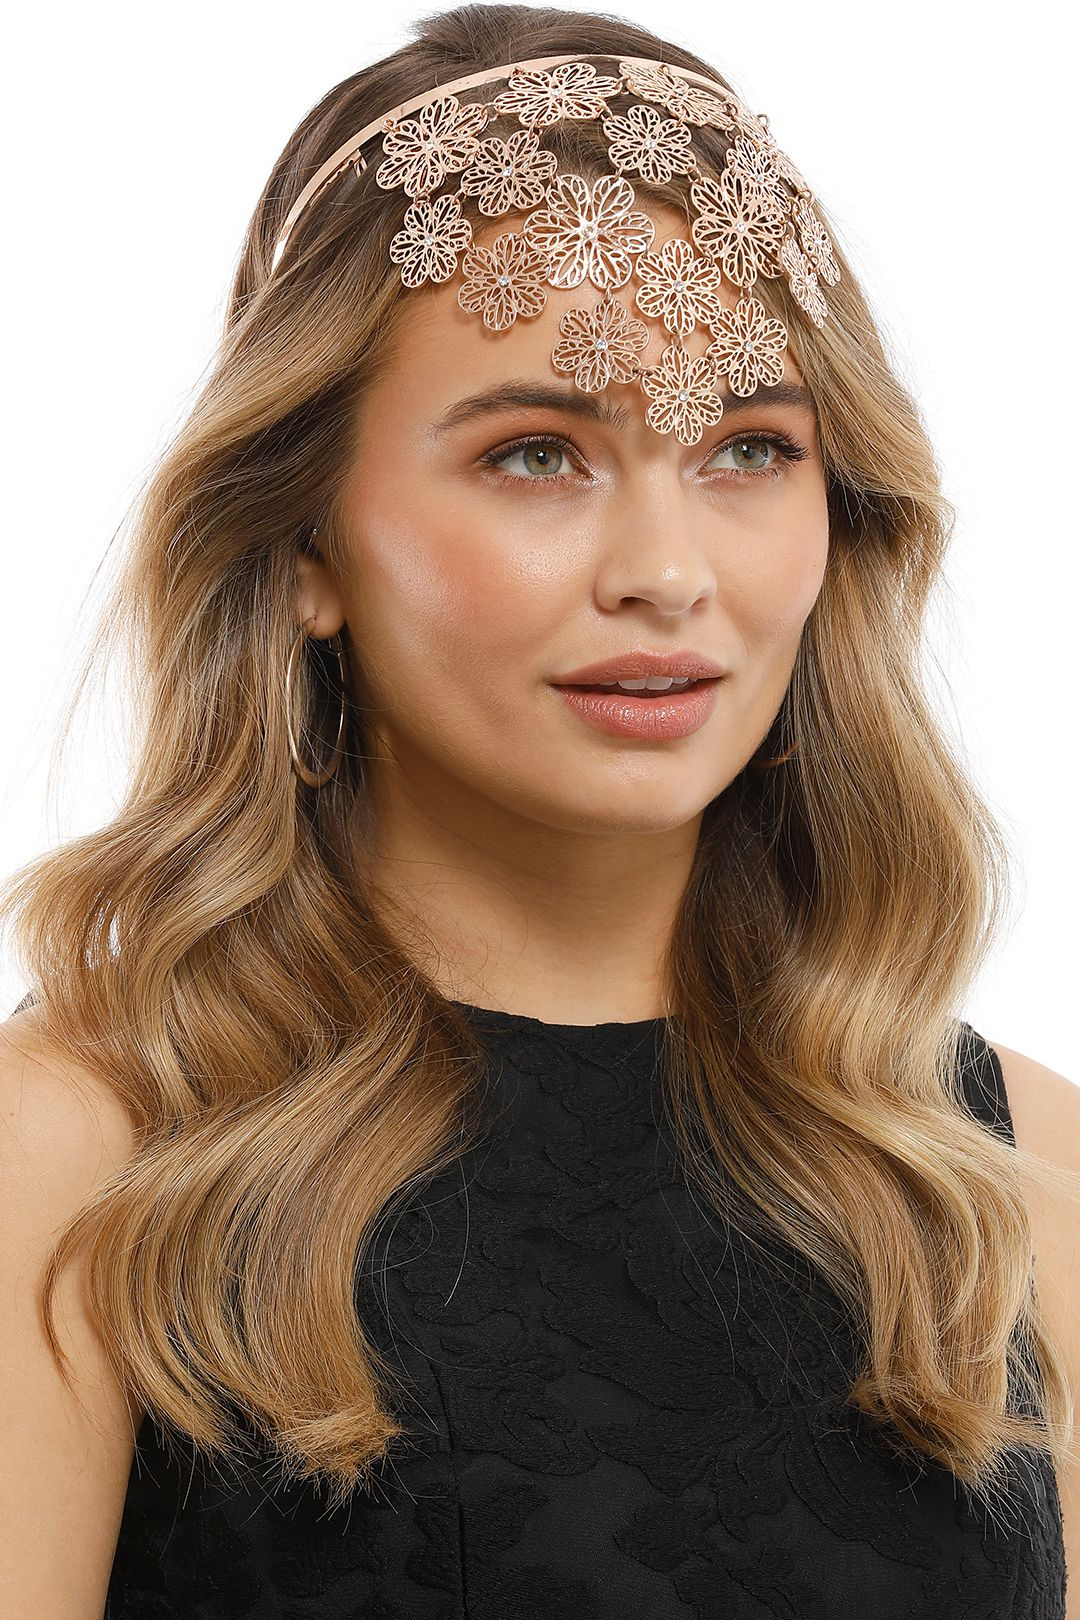 Olga Berg - Reyna Floral Metal Headband - Rose Gold - Side